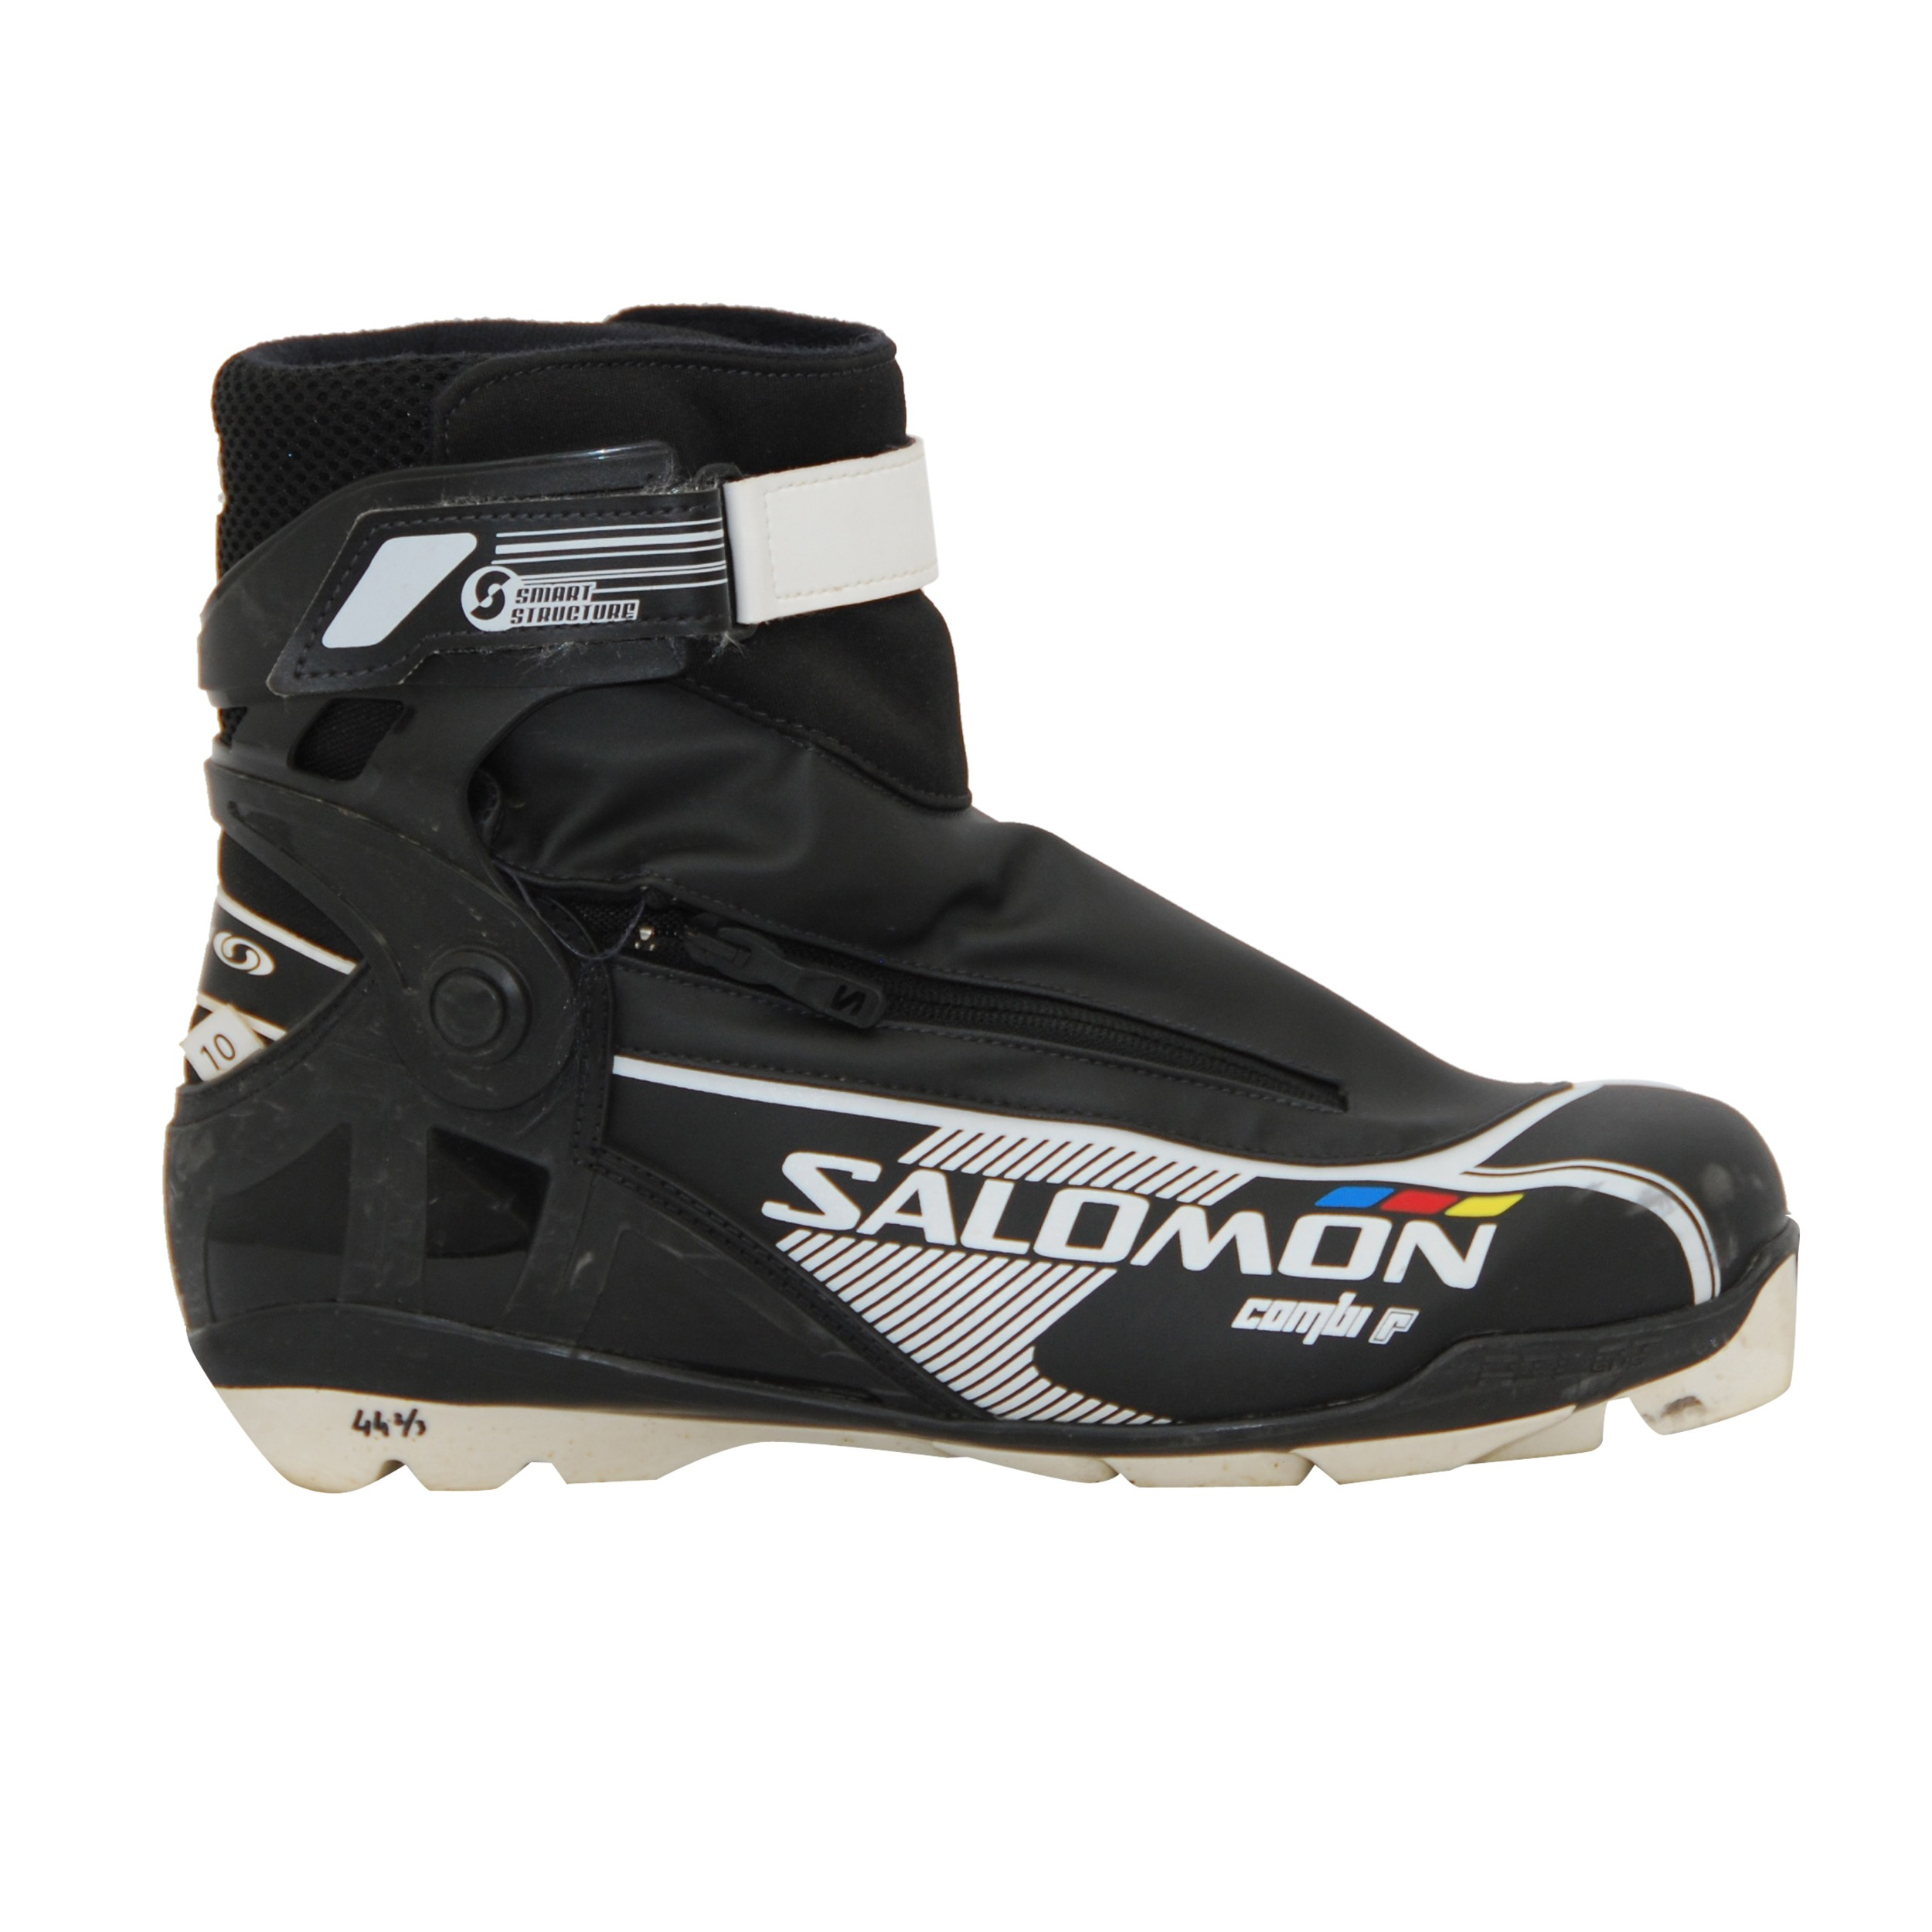 Chaussure ski fond occasion Salomon J SNS profil